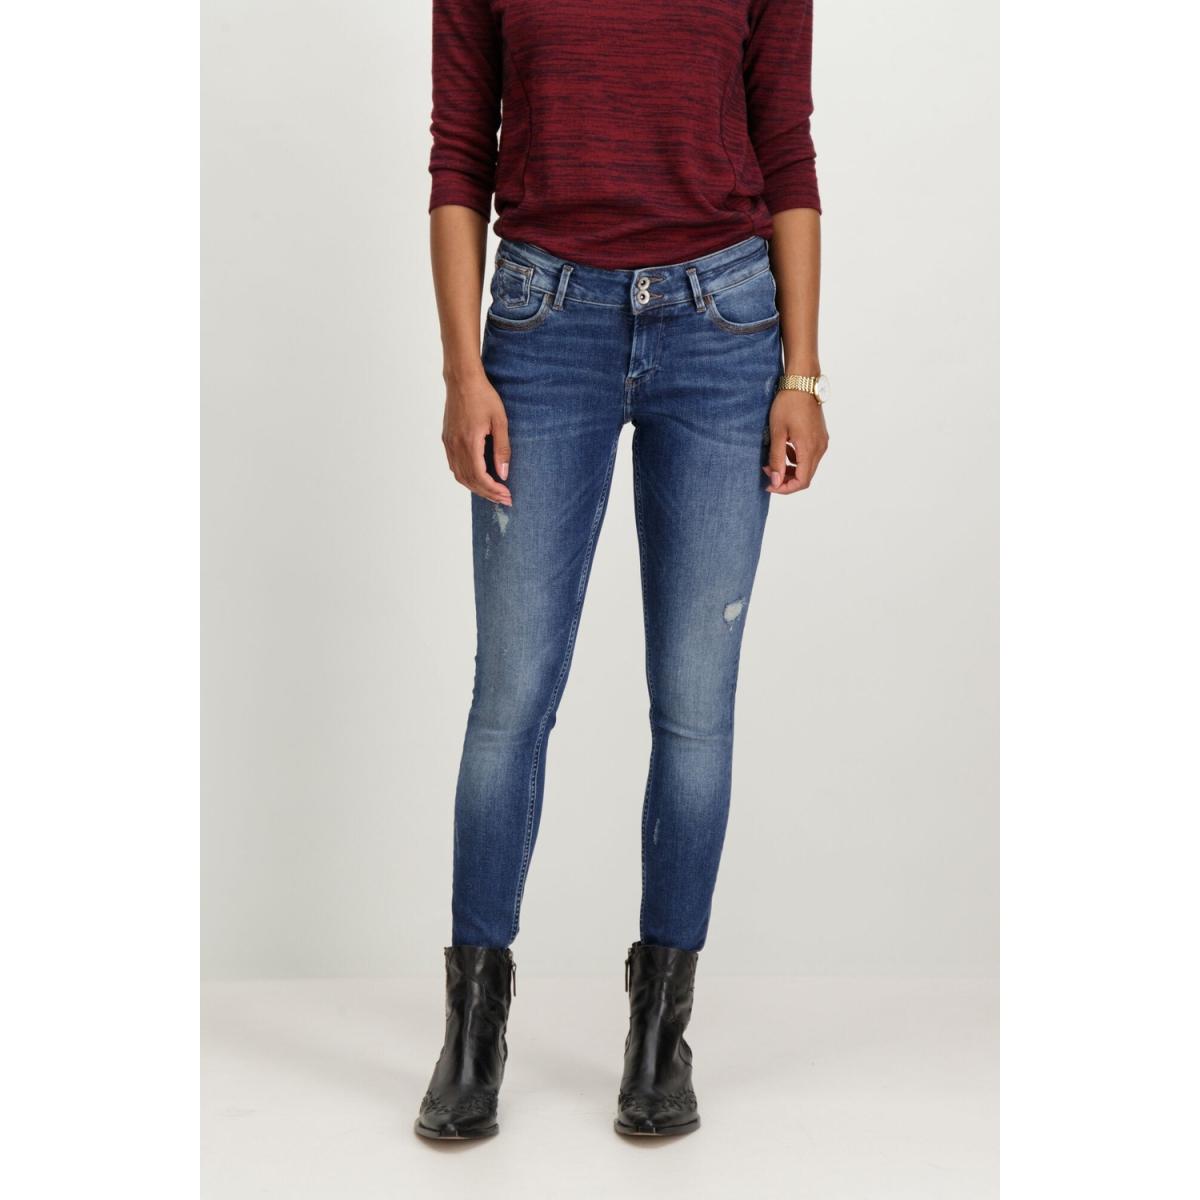 279 rachelle garcia jeans 7451